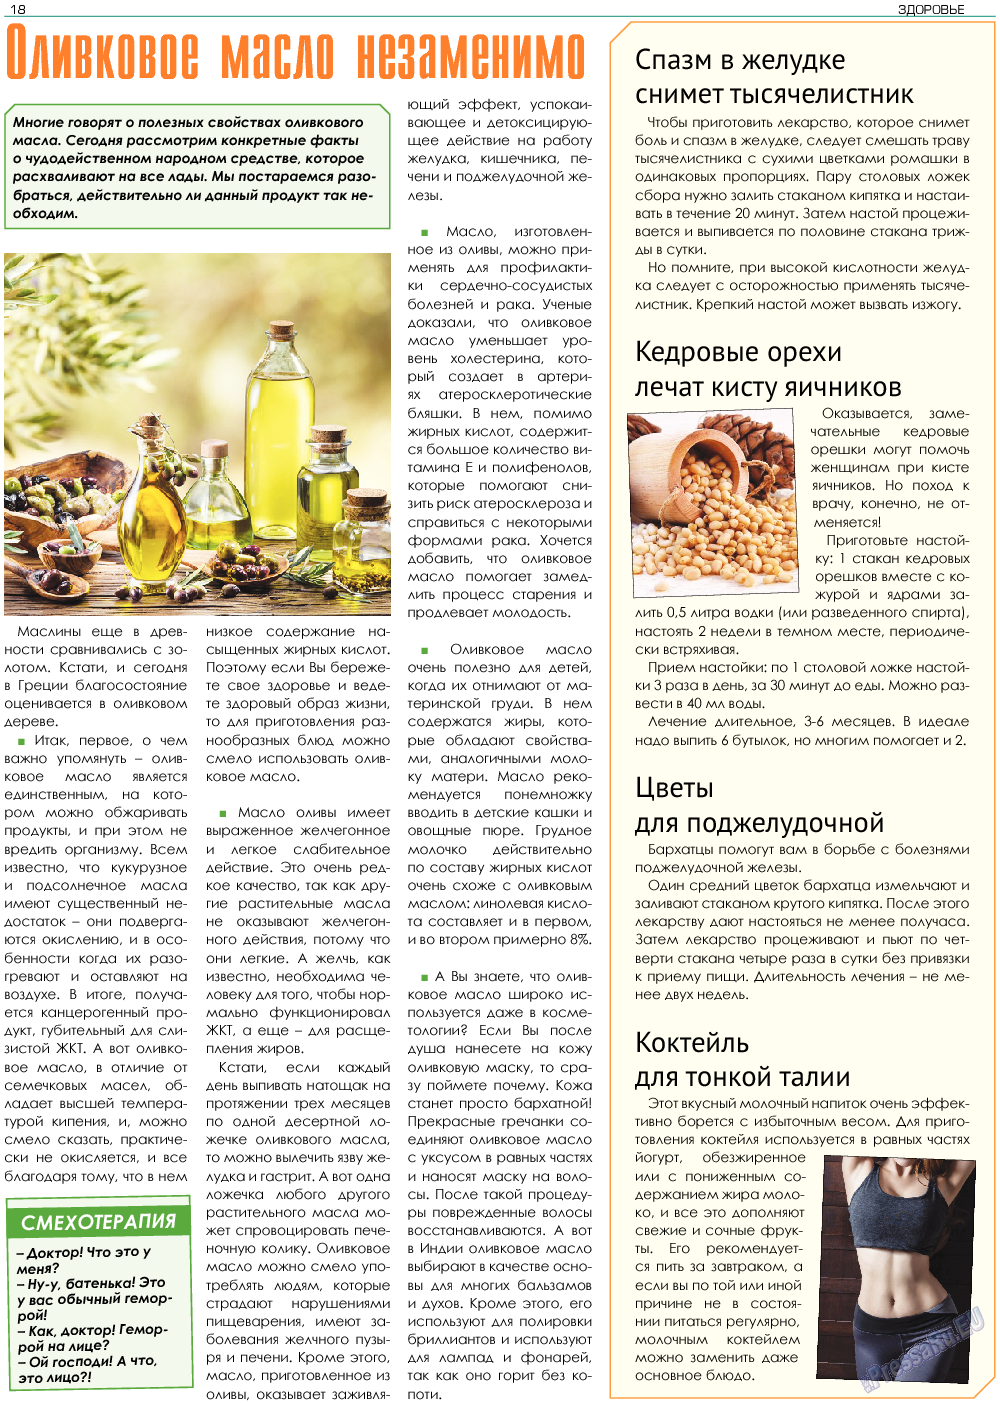 Здоровье (газета). 2018 год, номер 3, стр. 18